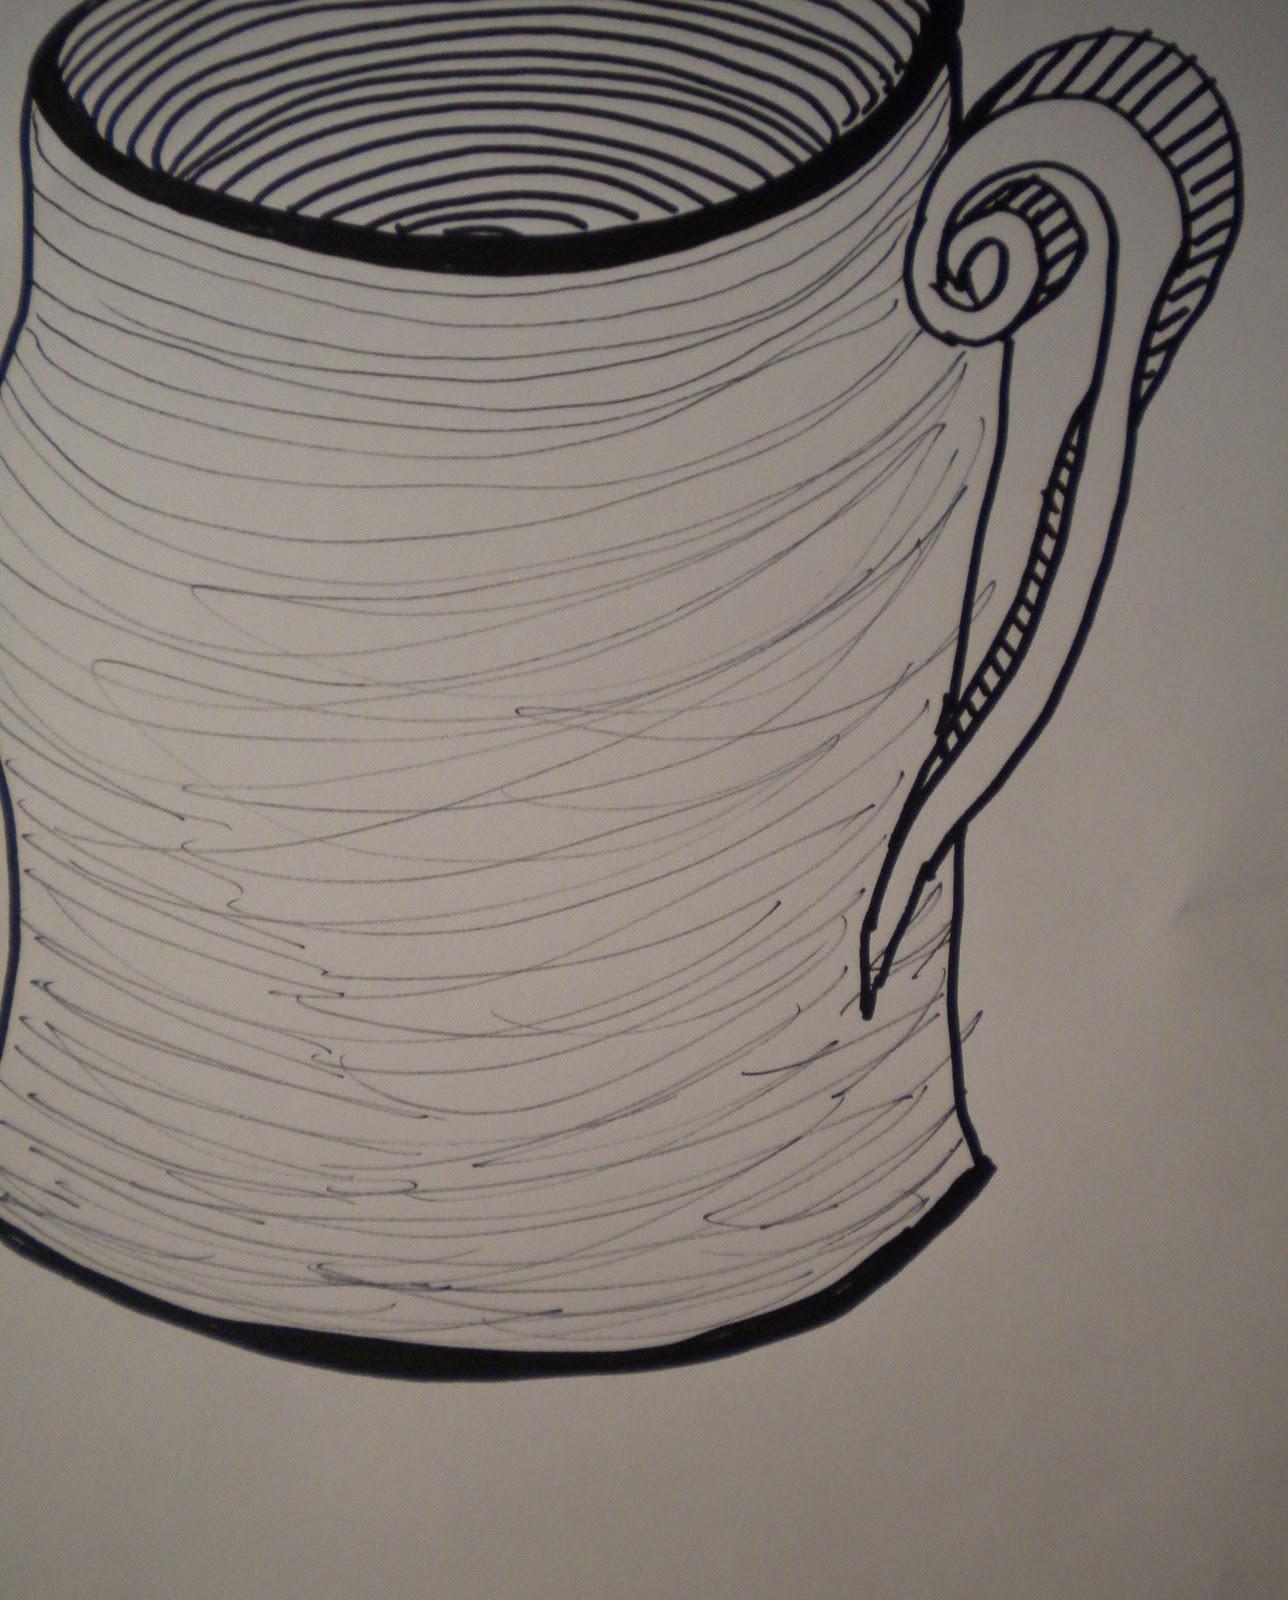 Contour Line Drawing Pumpkin : Lisa ploof drawing